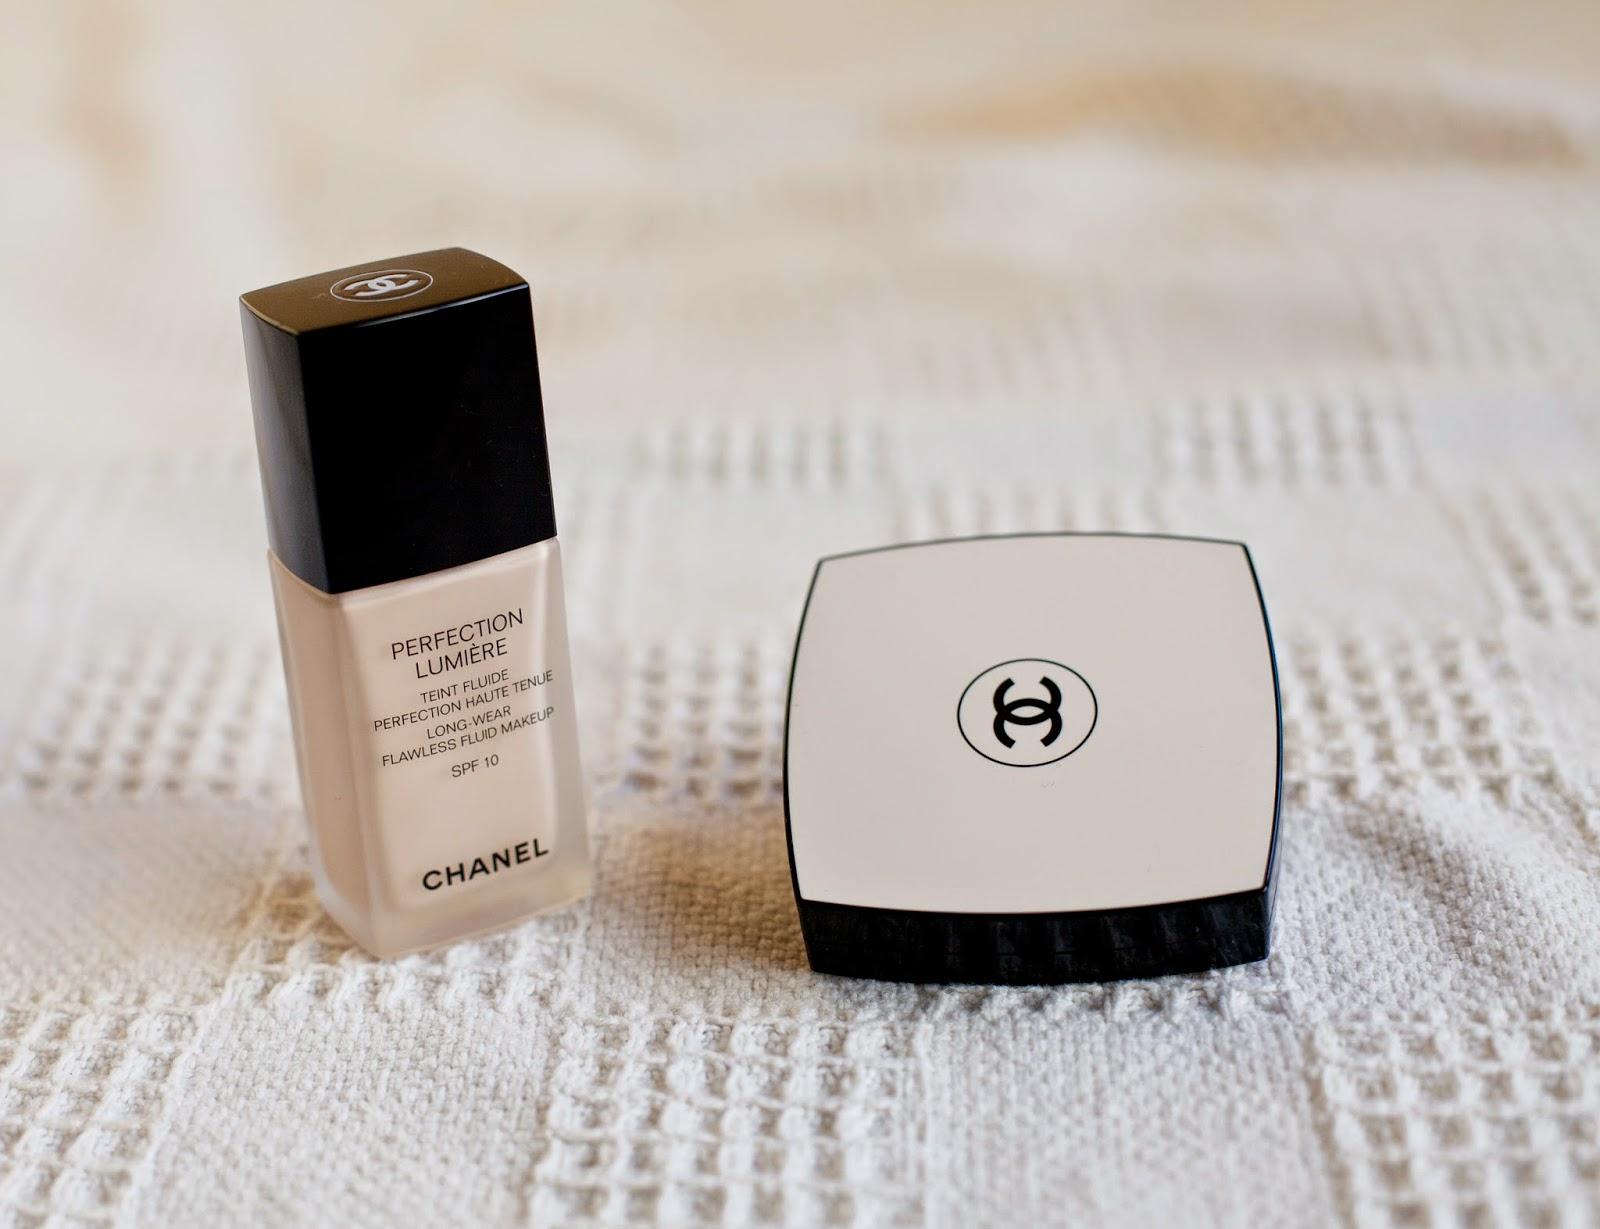 Chanel foundation make up